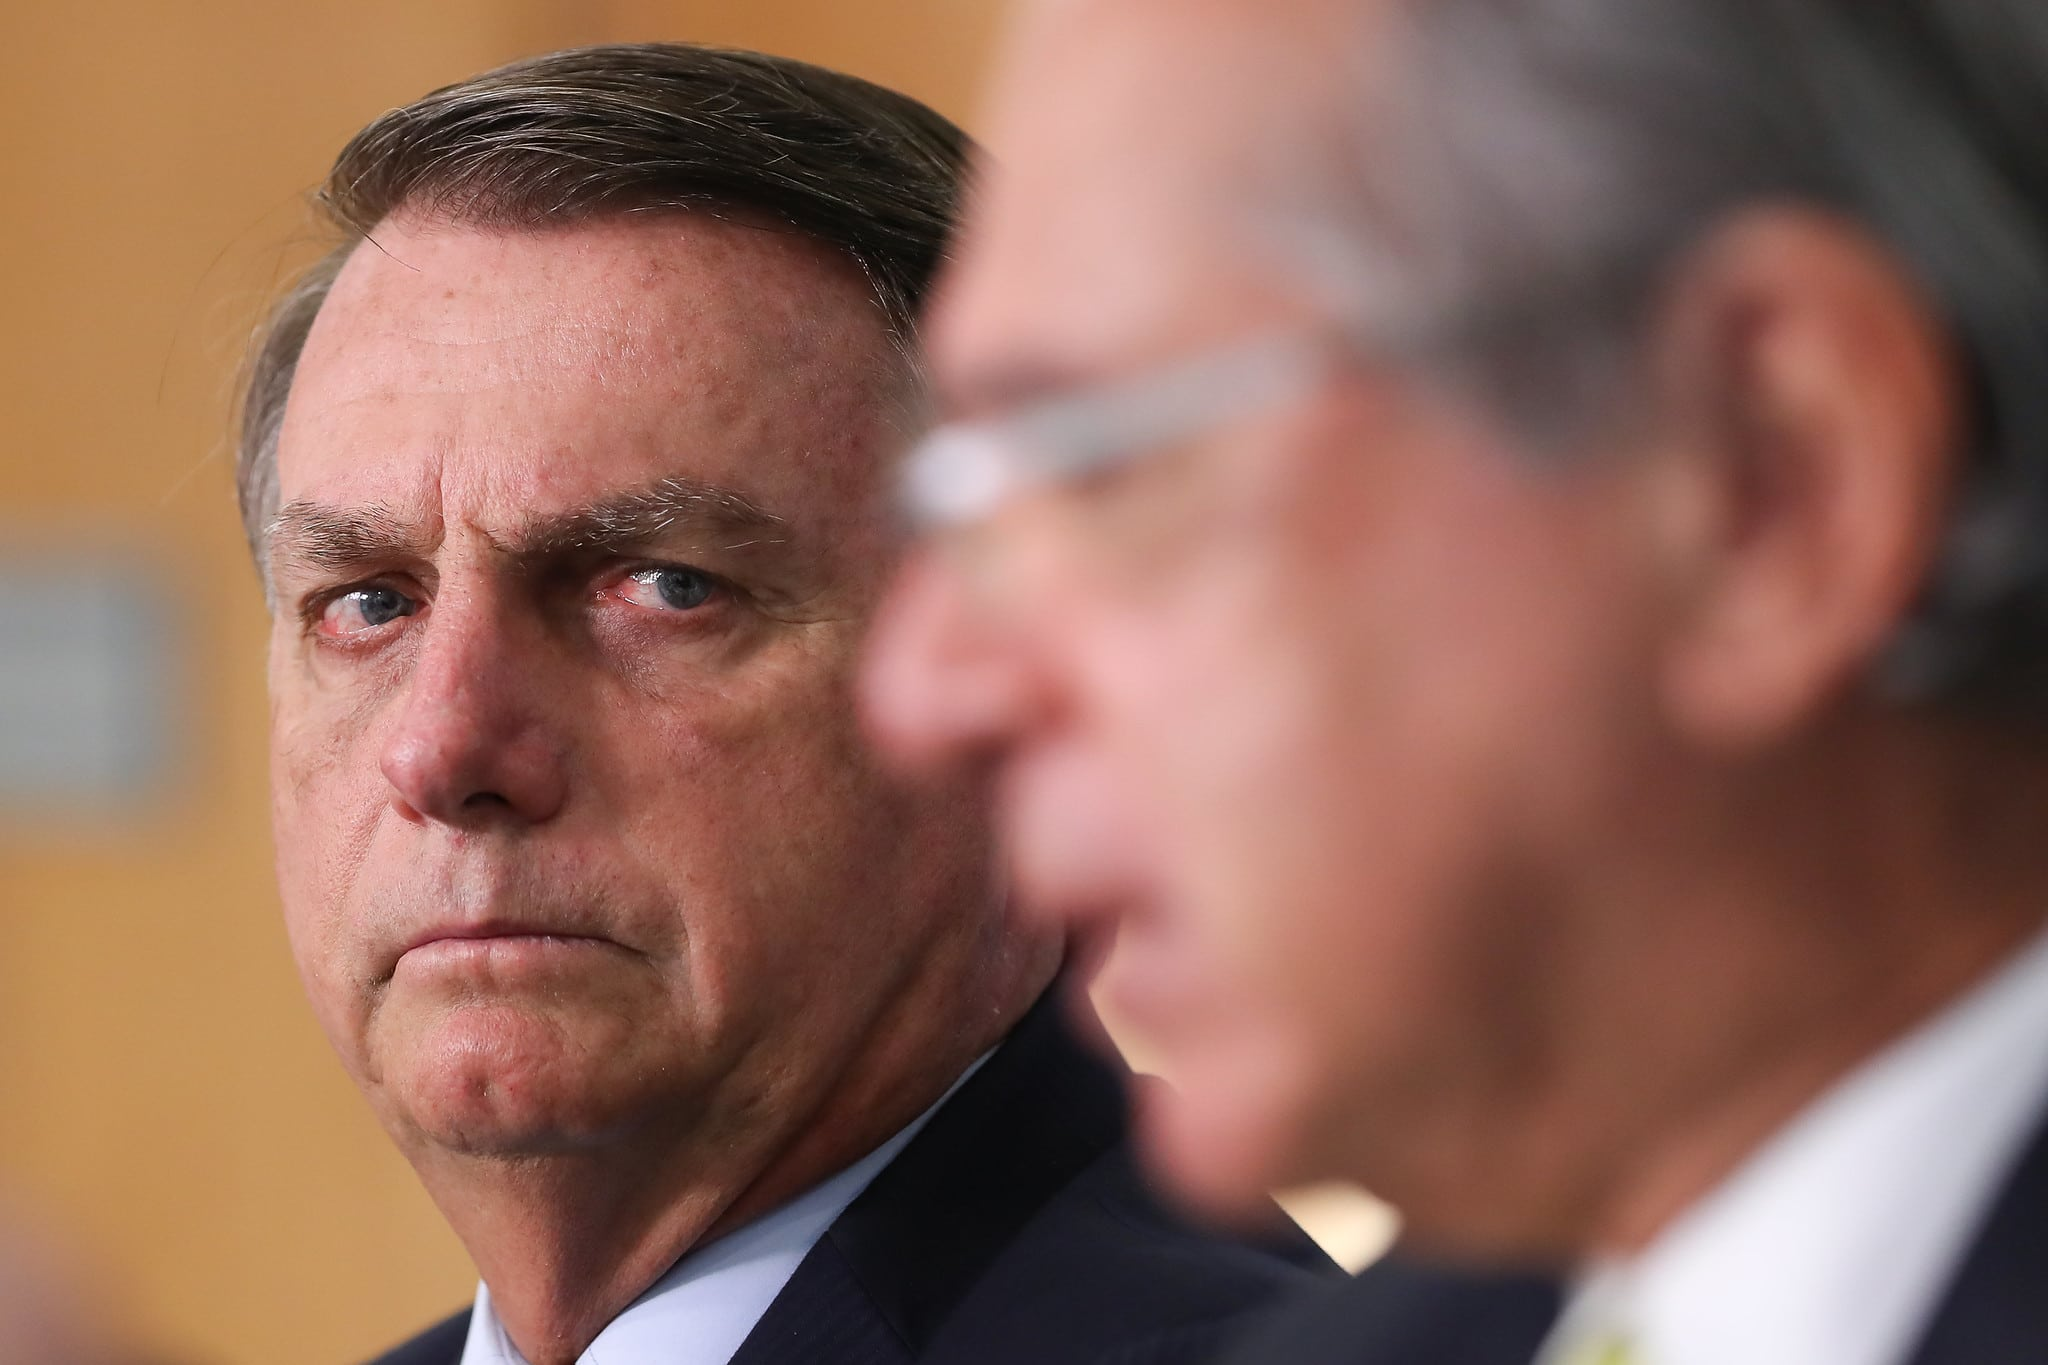 Bolsonaro descarta retorno do auxílio emergencial: 'Vai quebrar o Brasil'